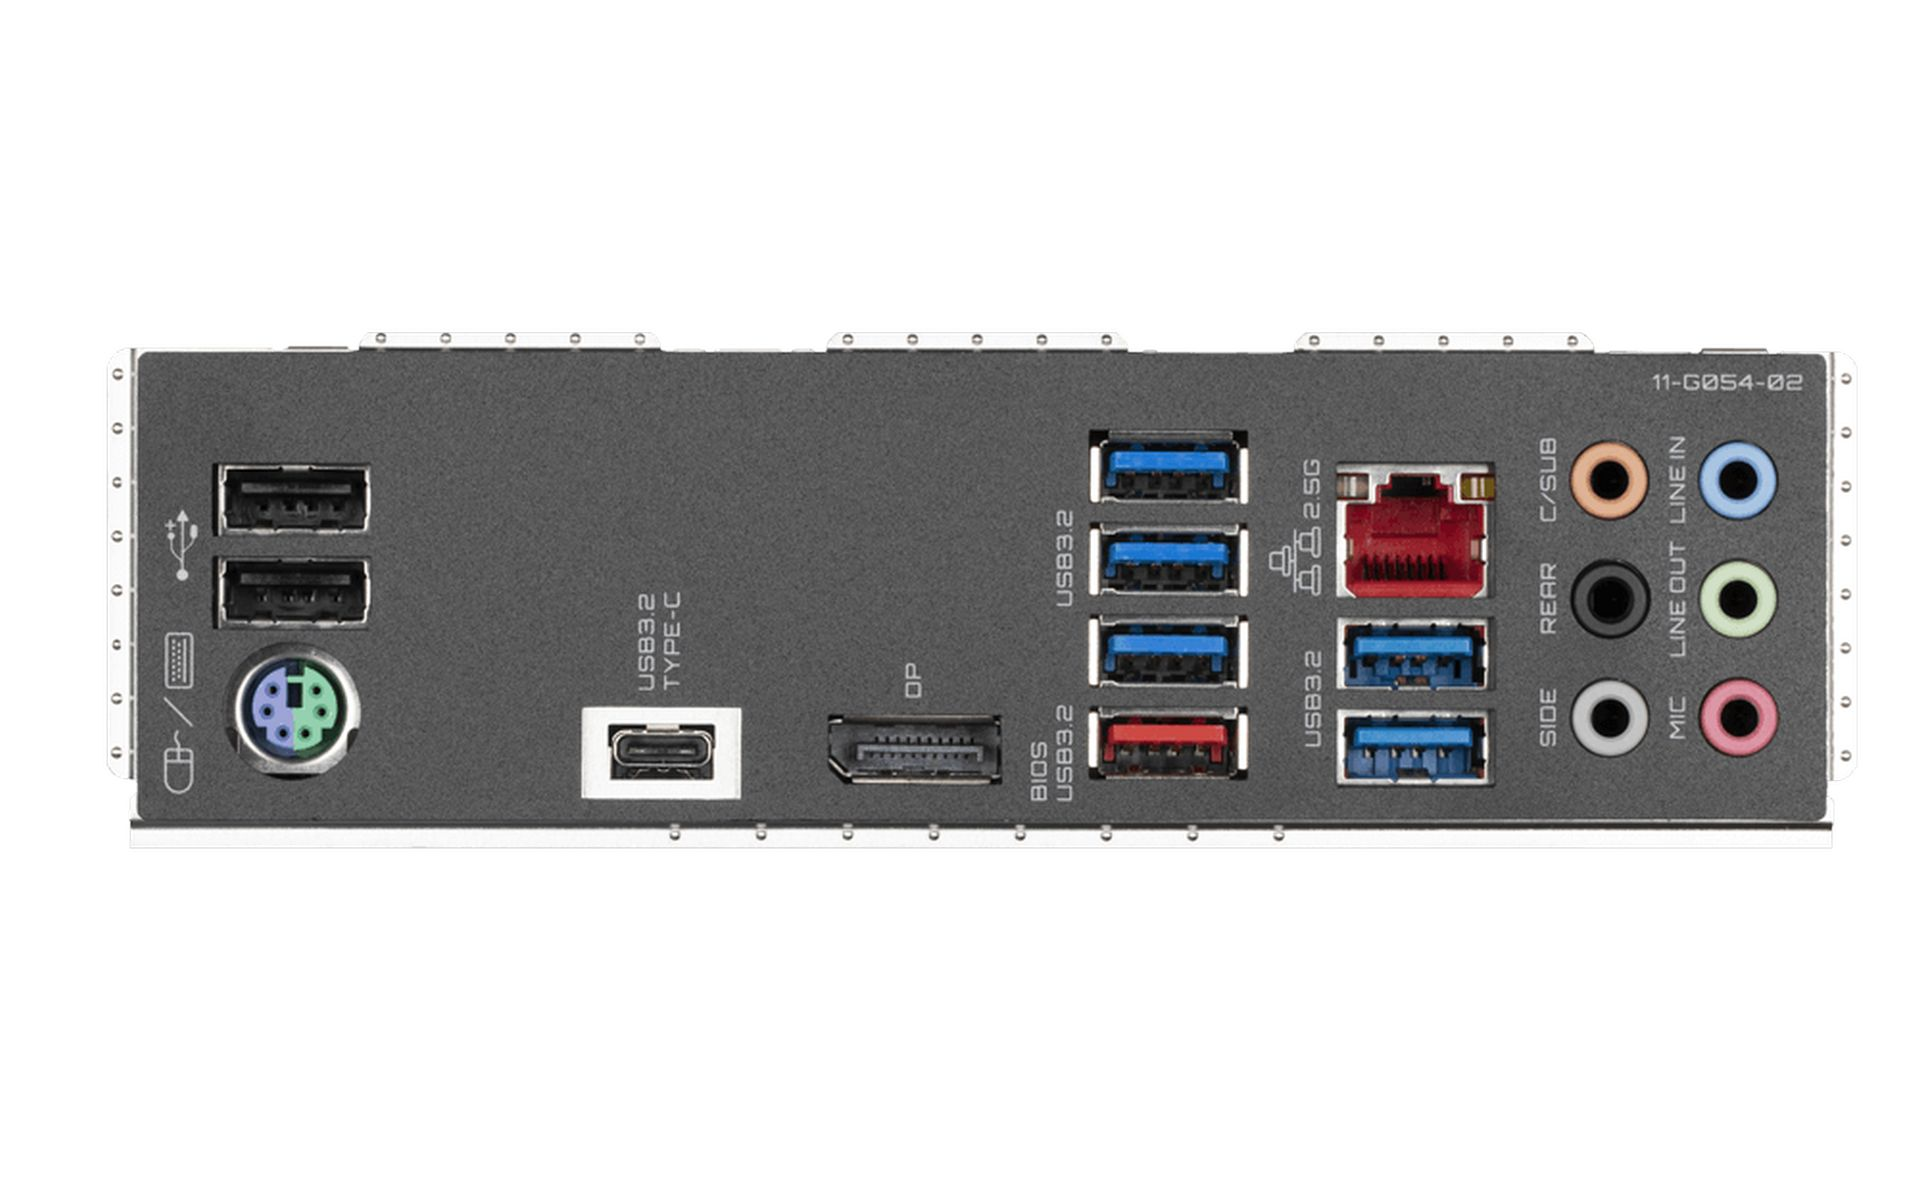 Z590 GAMING X sử dụng mạng LAN 2.5G